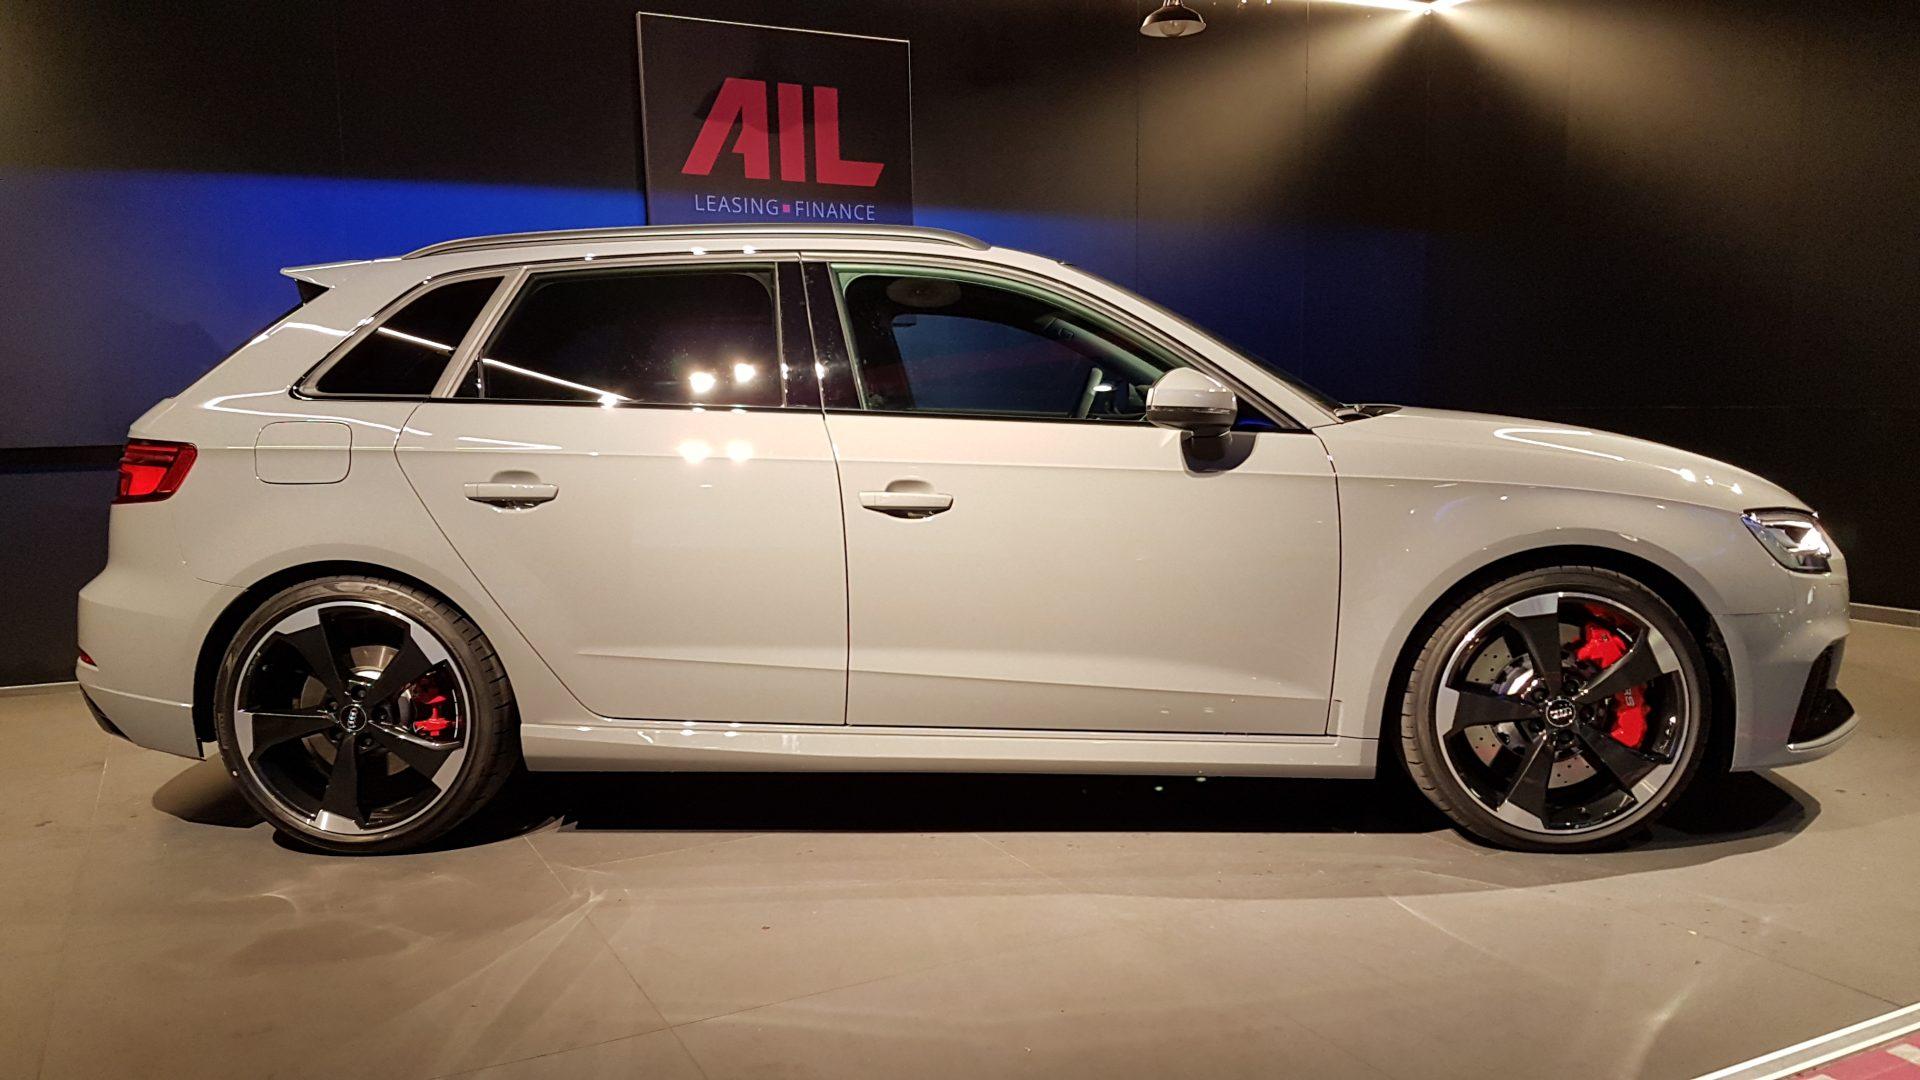 AIL Audi RS3 Sportback Matrix Virtual Panorama 3